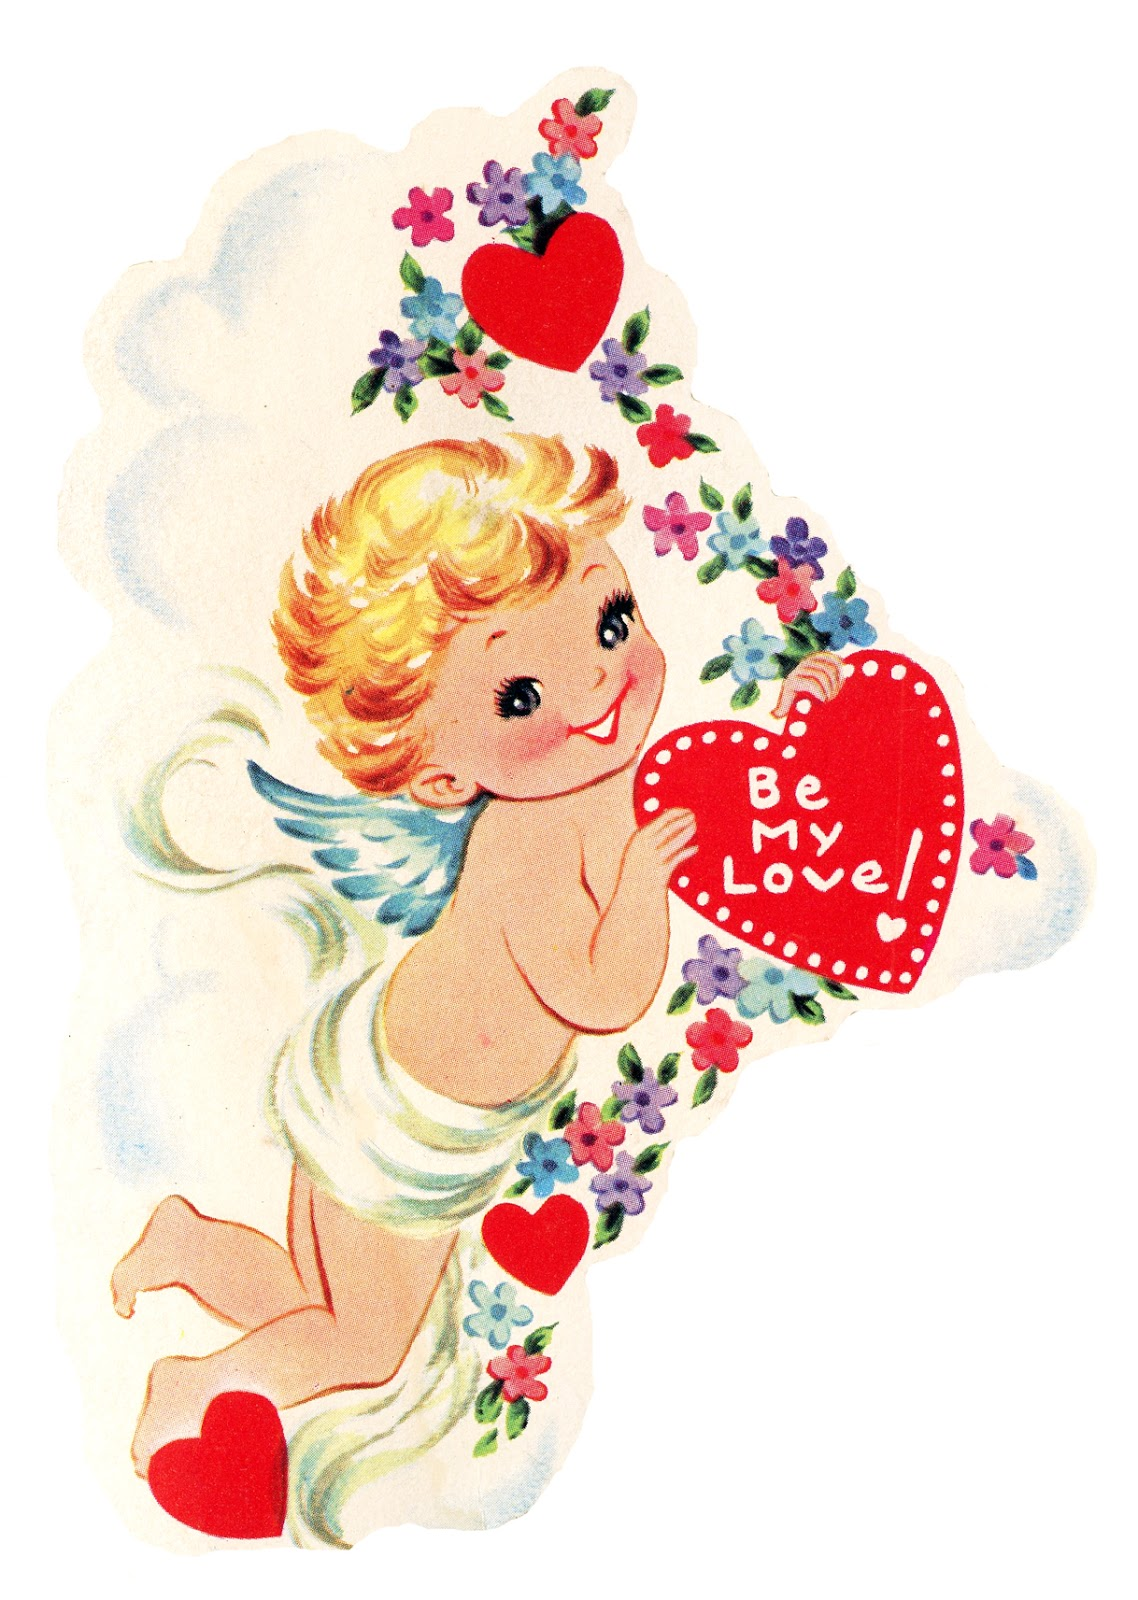 Free-Vintage-Valentines-Image-GraphicsFairy1.jpg